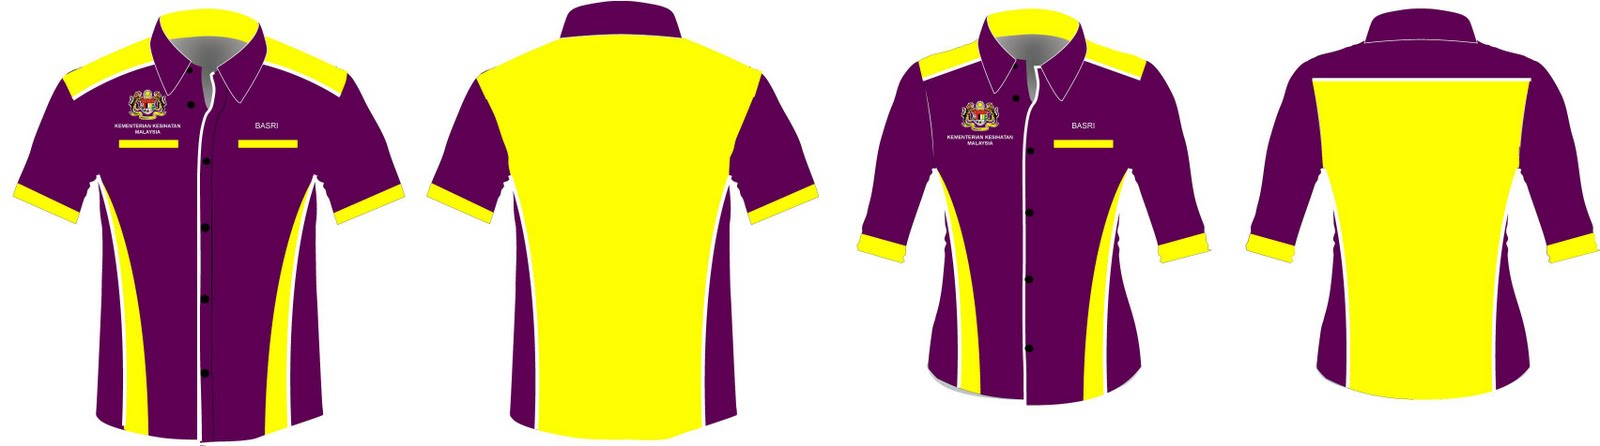 Design f1 shirt hkl corporate shirts design f1 shirt hkl maxwellsz